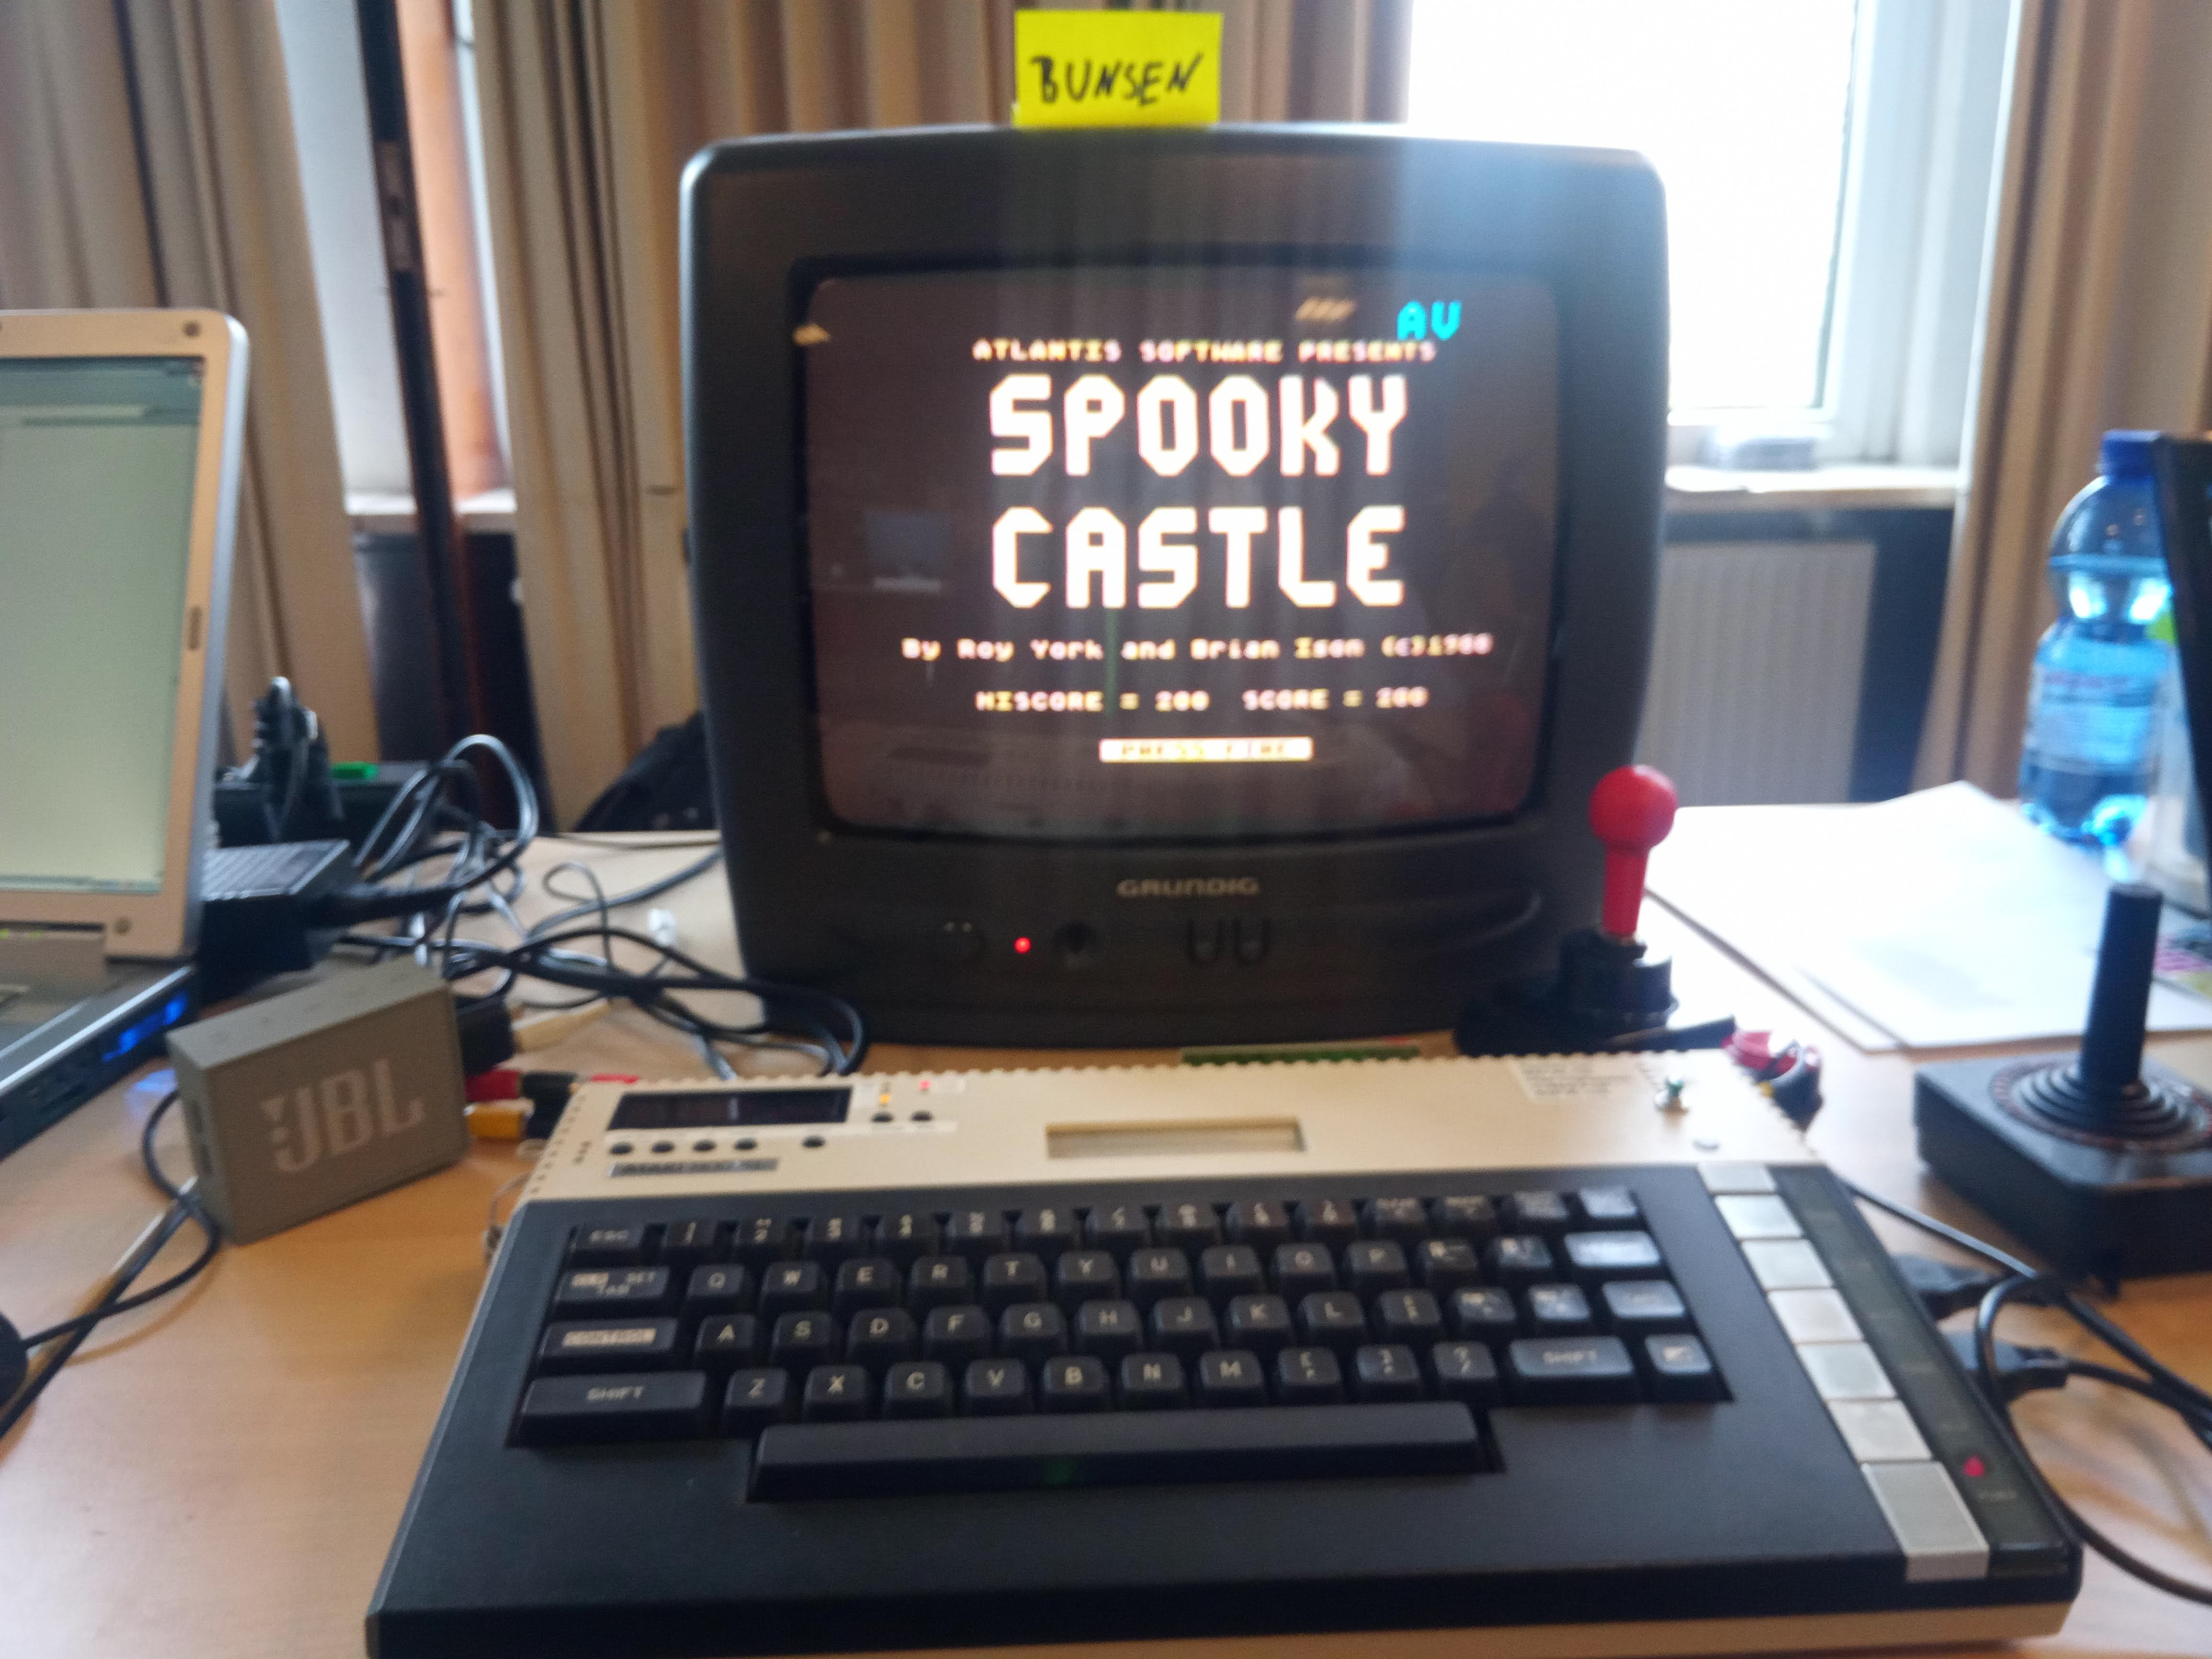 Bunsen: Spooky Castle (Atari 400/800/XL/XE) 200 points on 2019-07-02 12:32:08